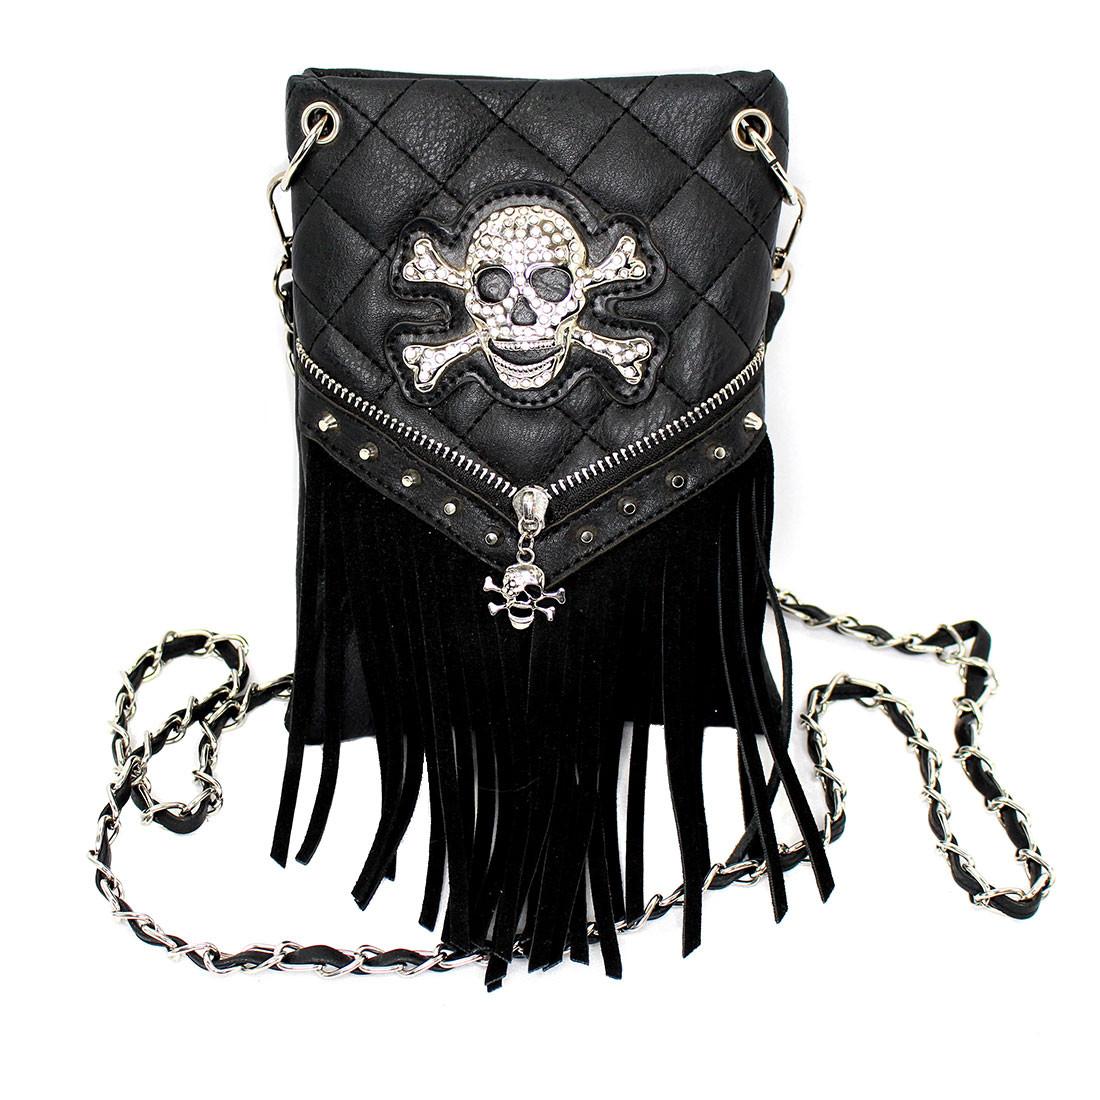 Skull and crossbone black fringe crossbody purse.